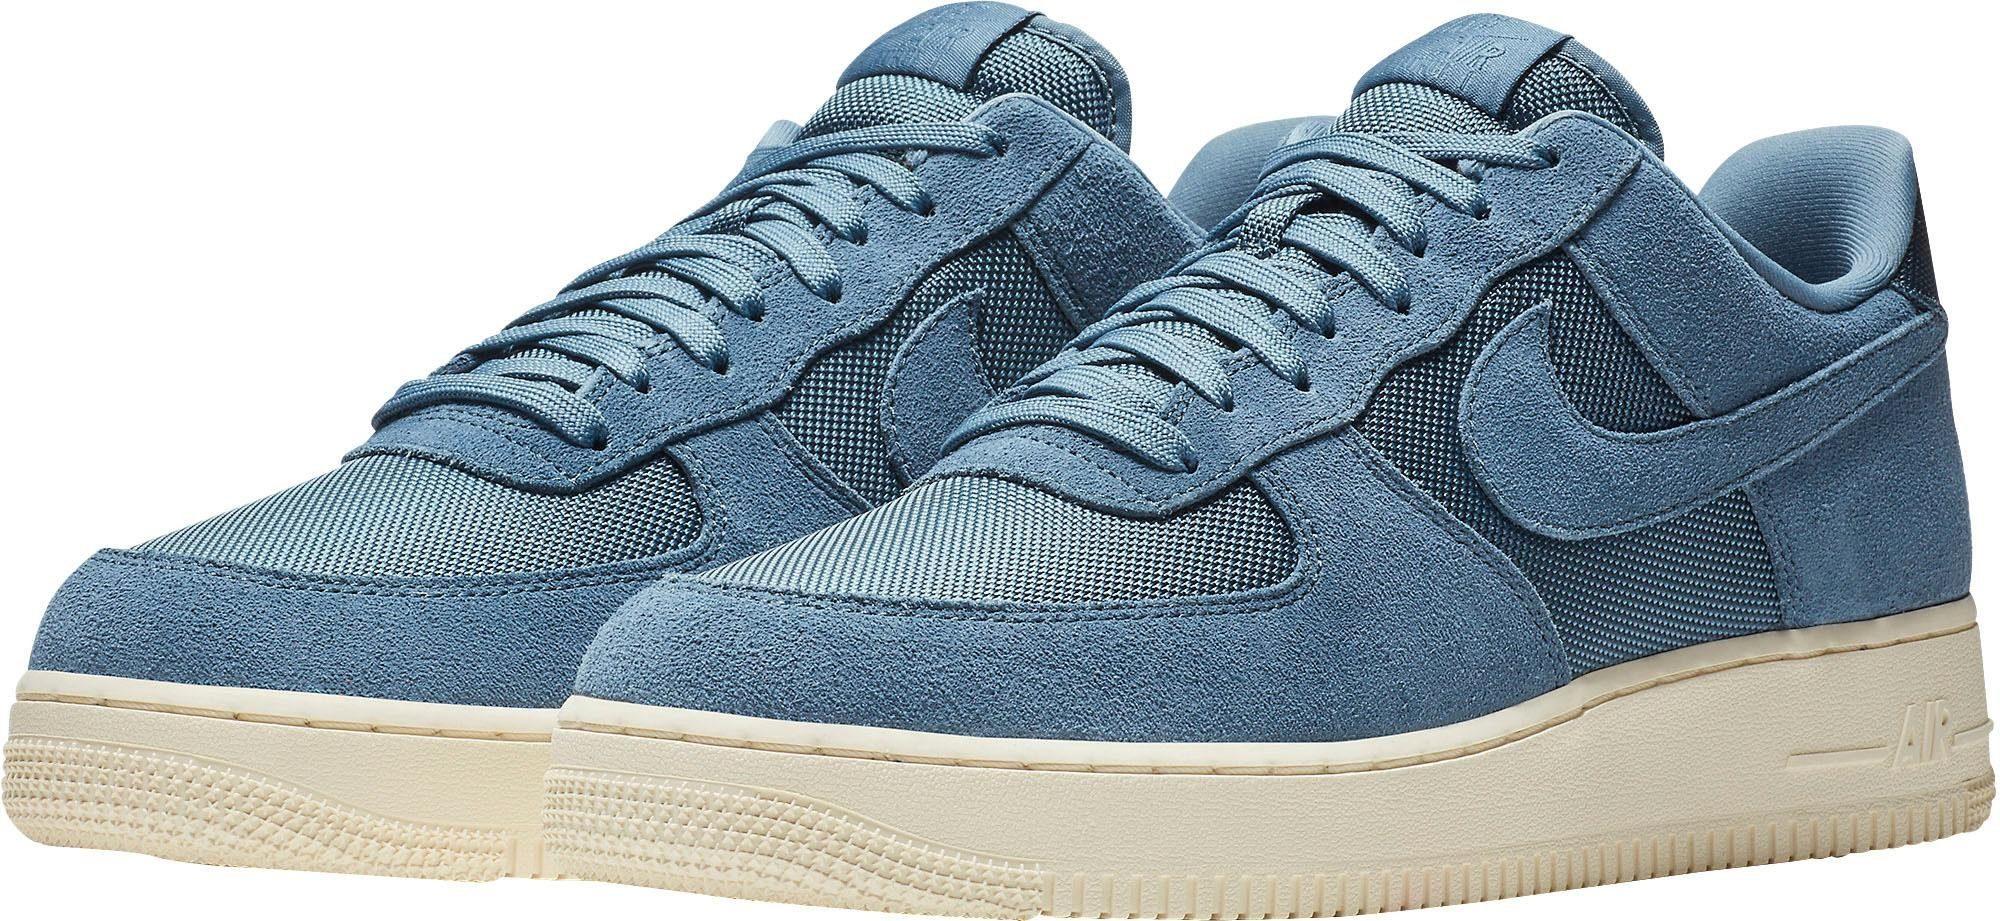 Nike Sportswear »AIR FORCE 1« Sneaker, Weiches Obermaterial